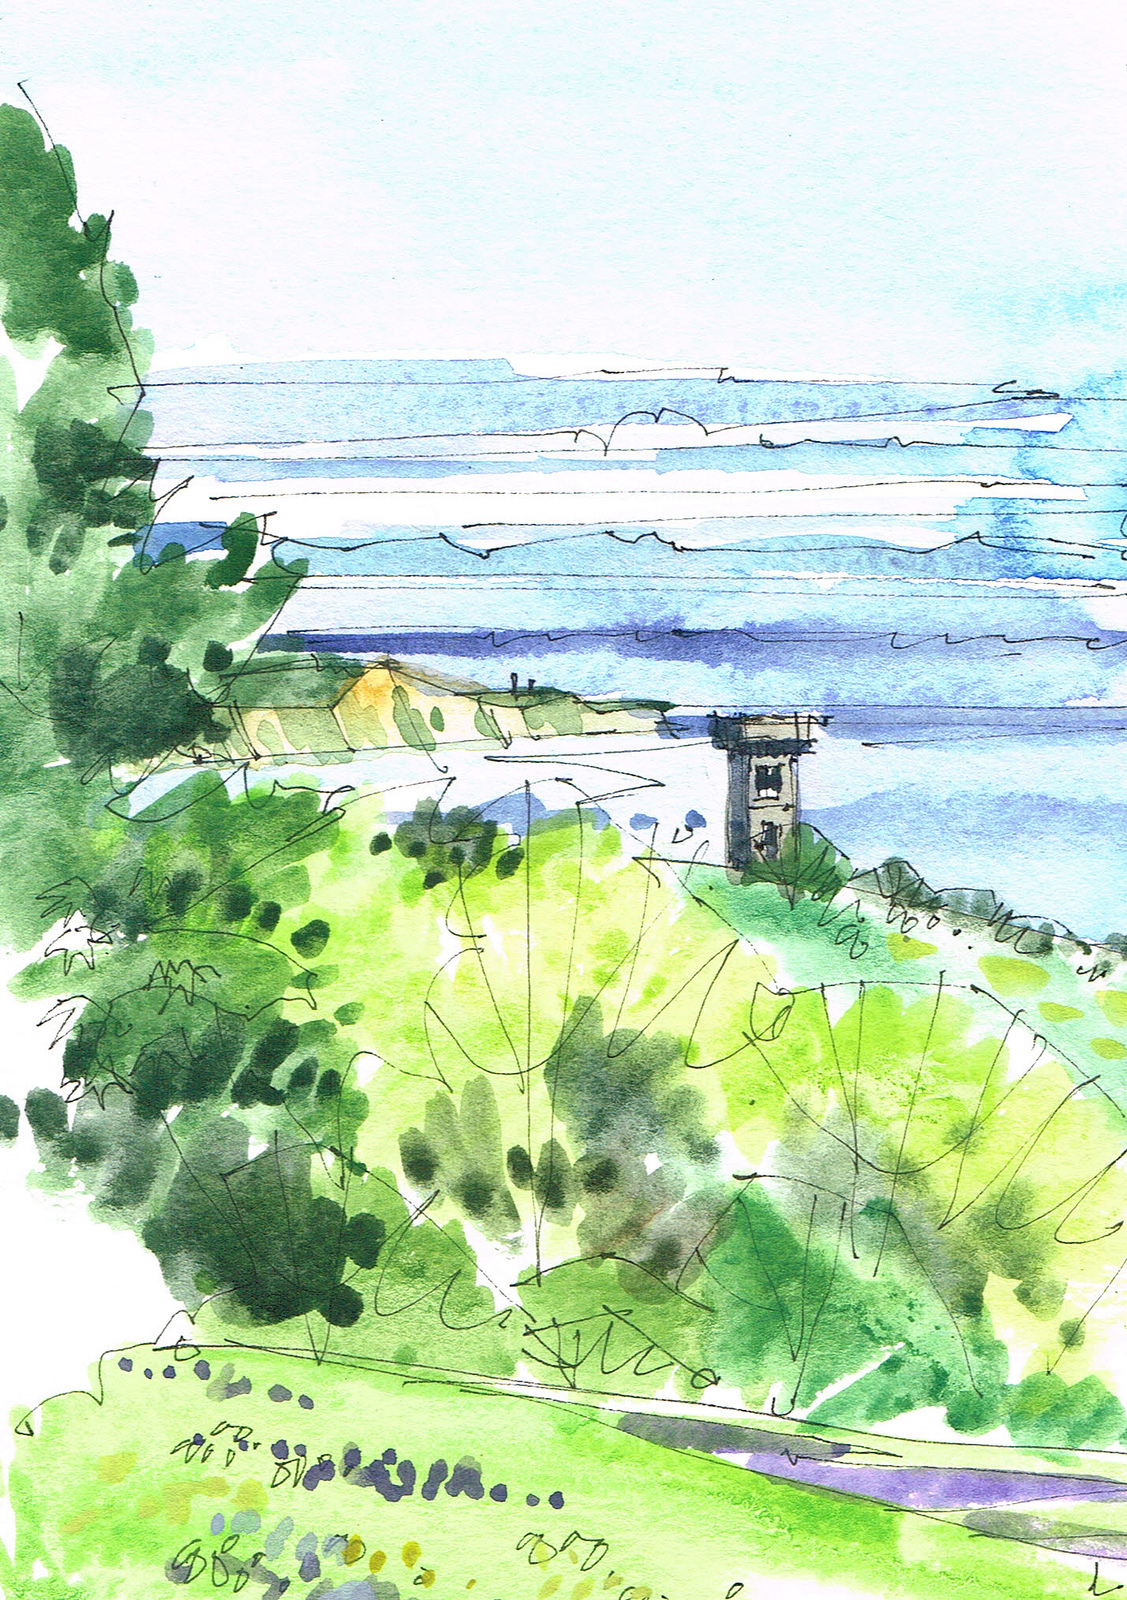 isle of man-albert tower20130709